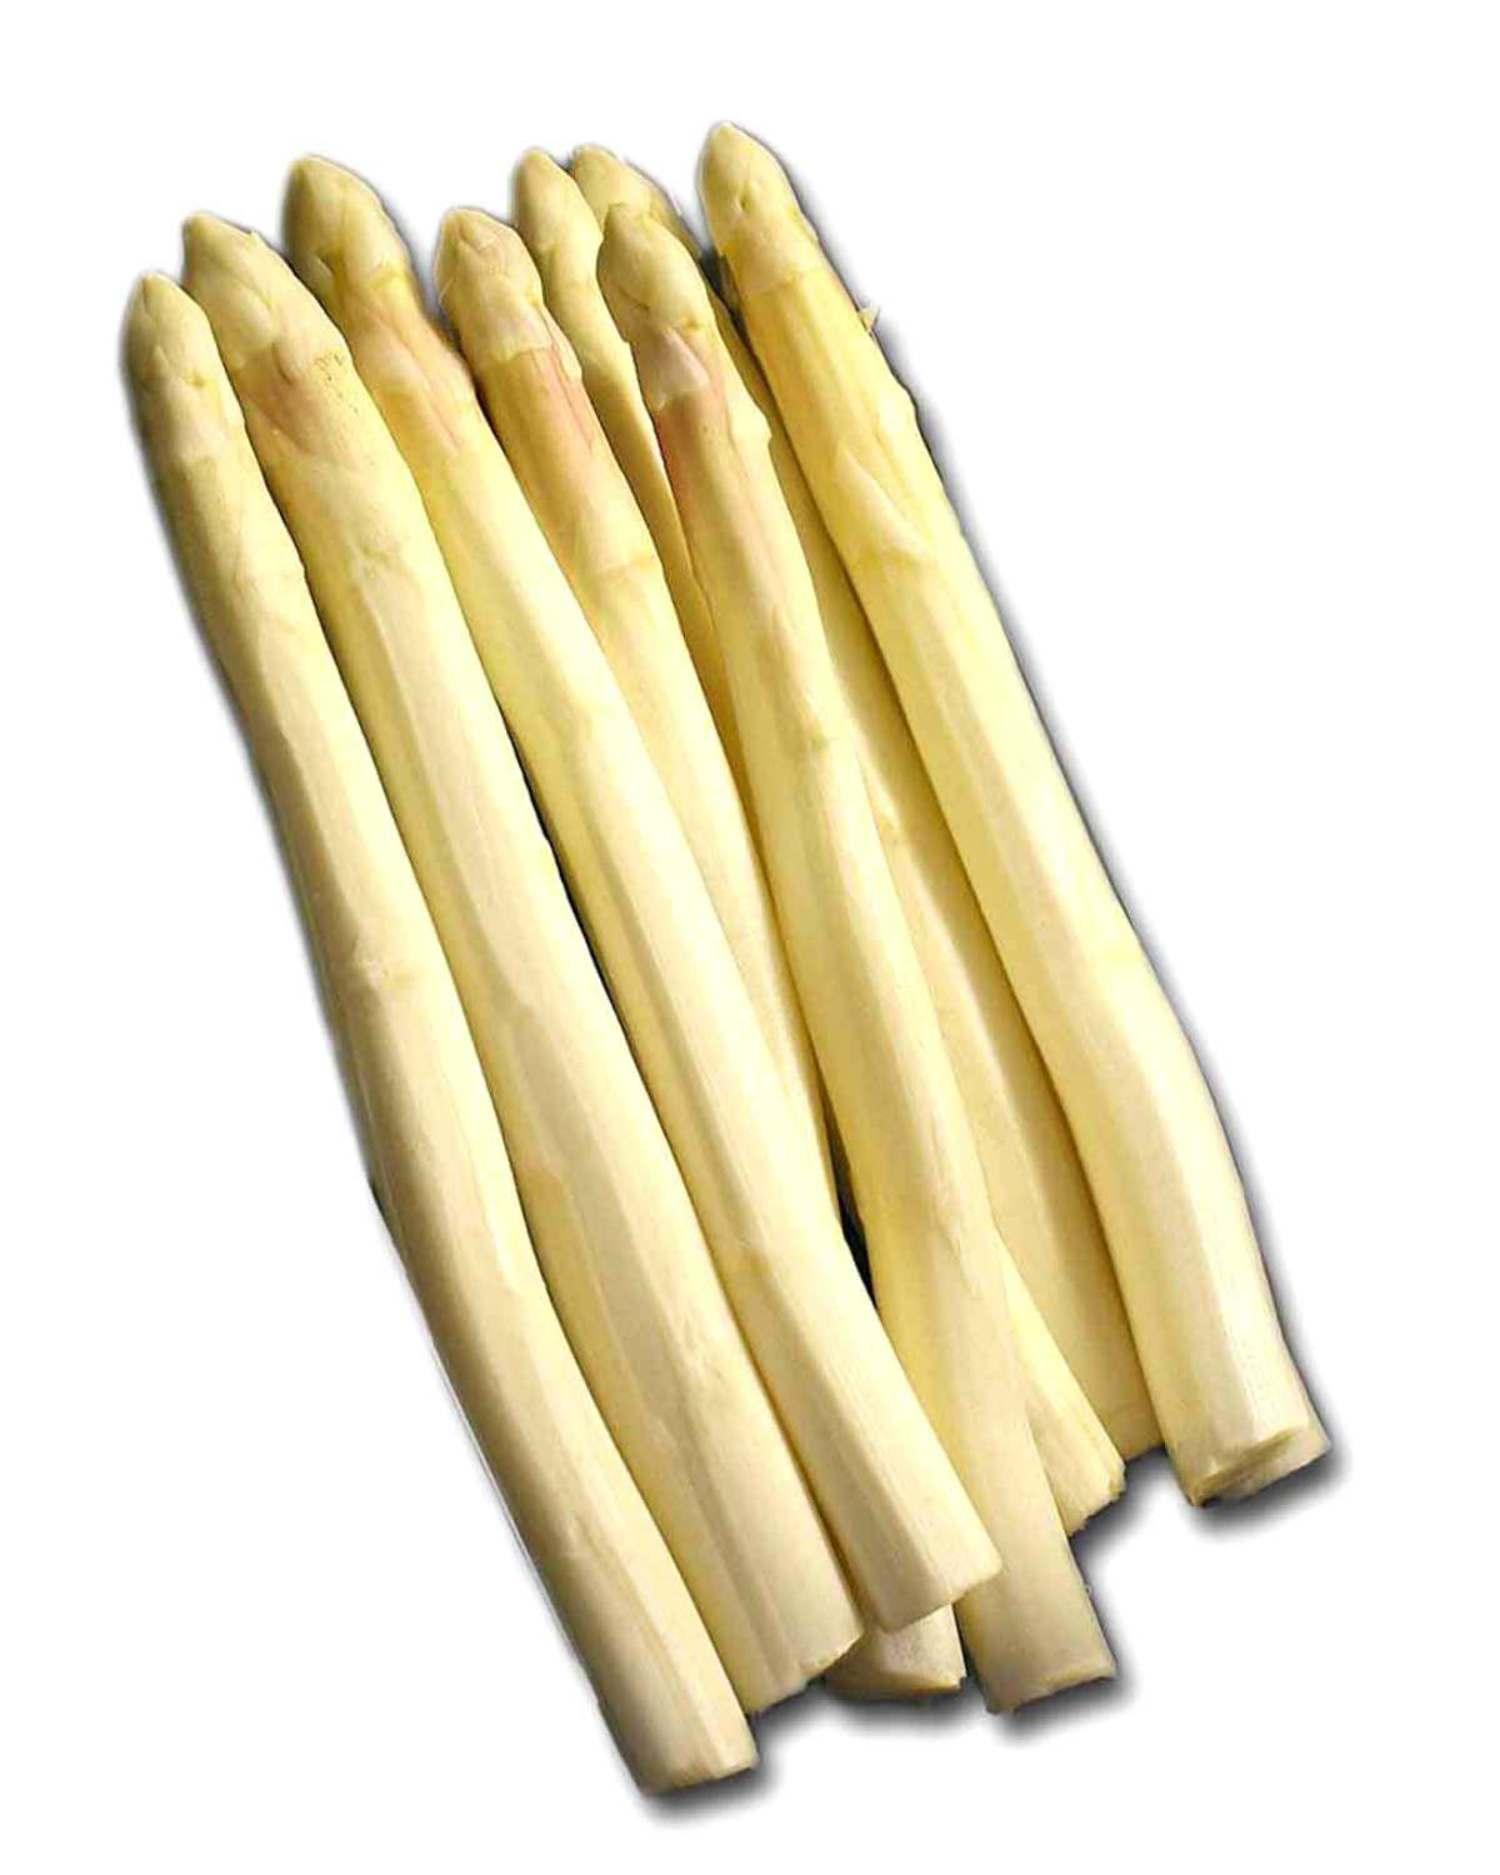 White Asparagus Open Fotos Free Open Source Photos Public Domain Photos And Pictures